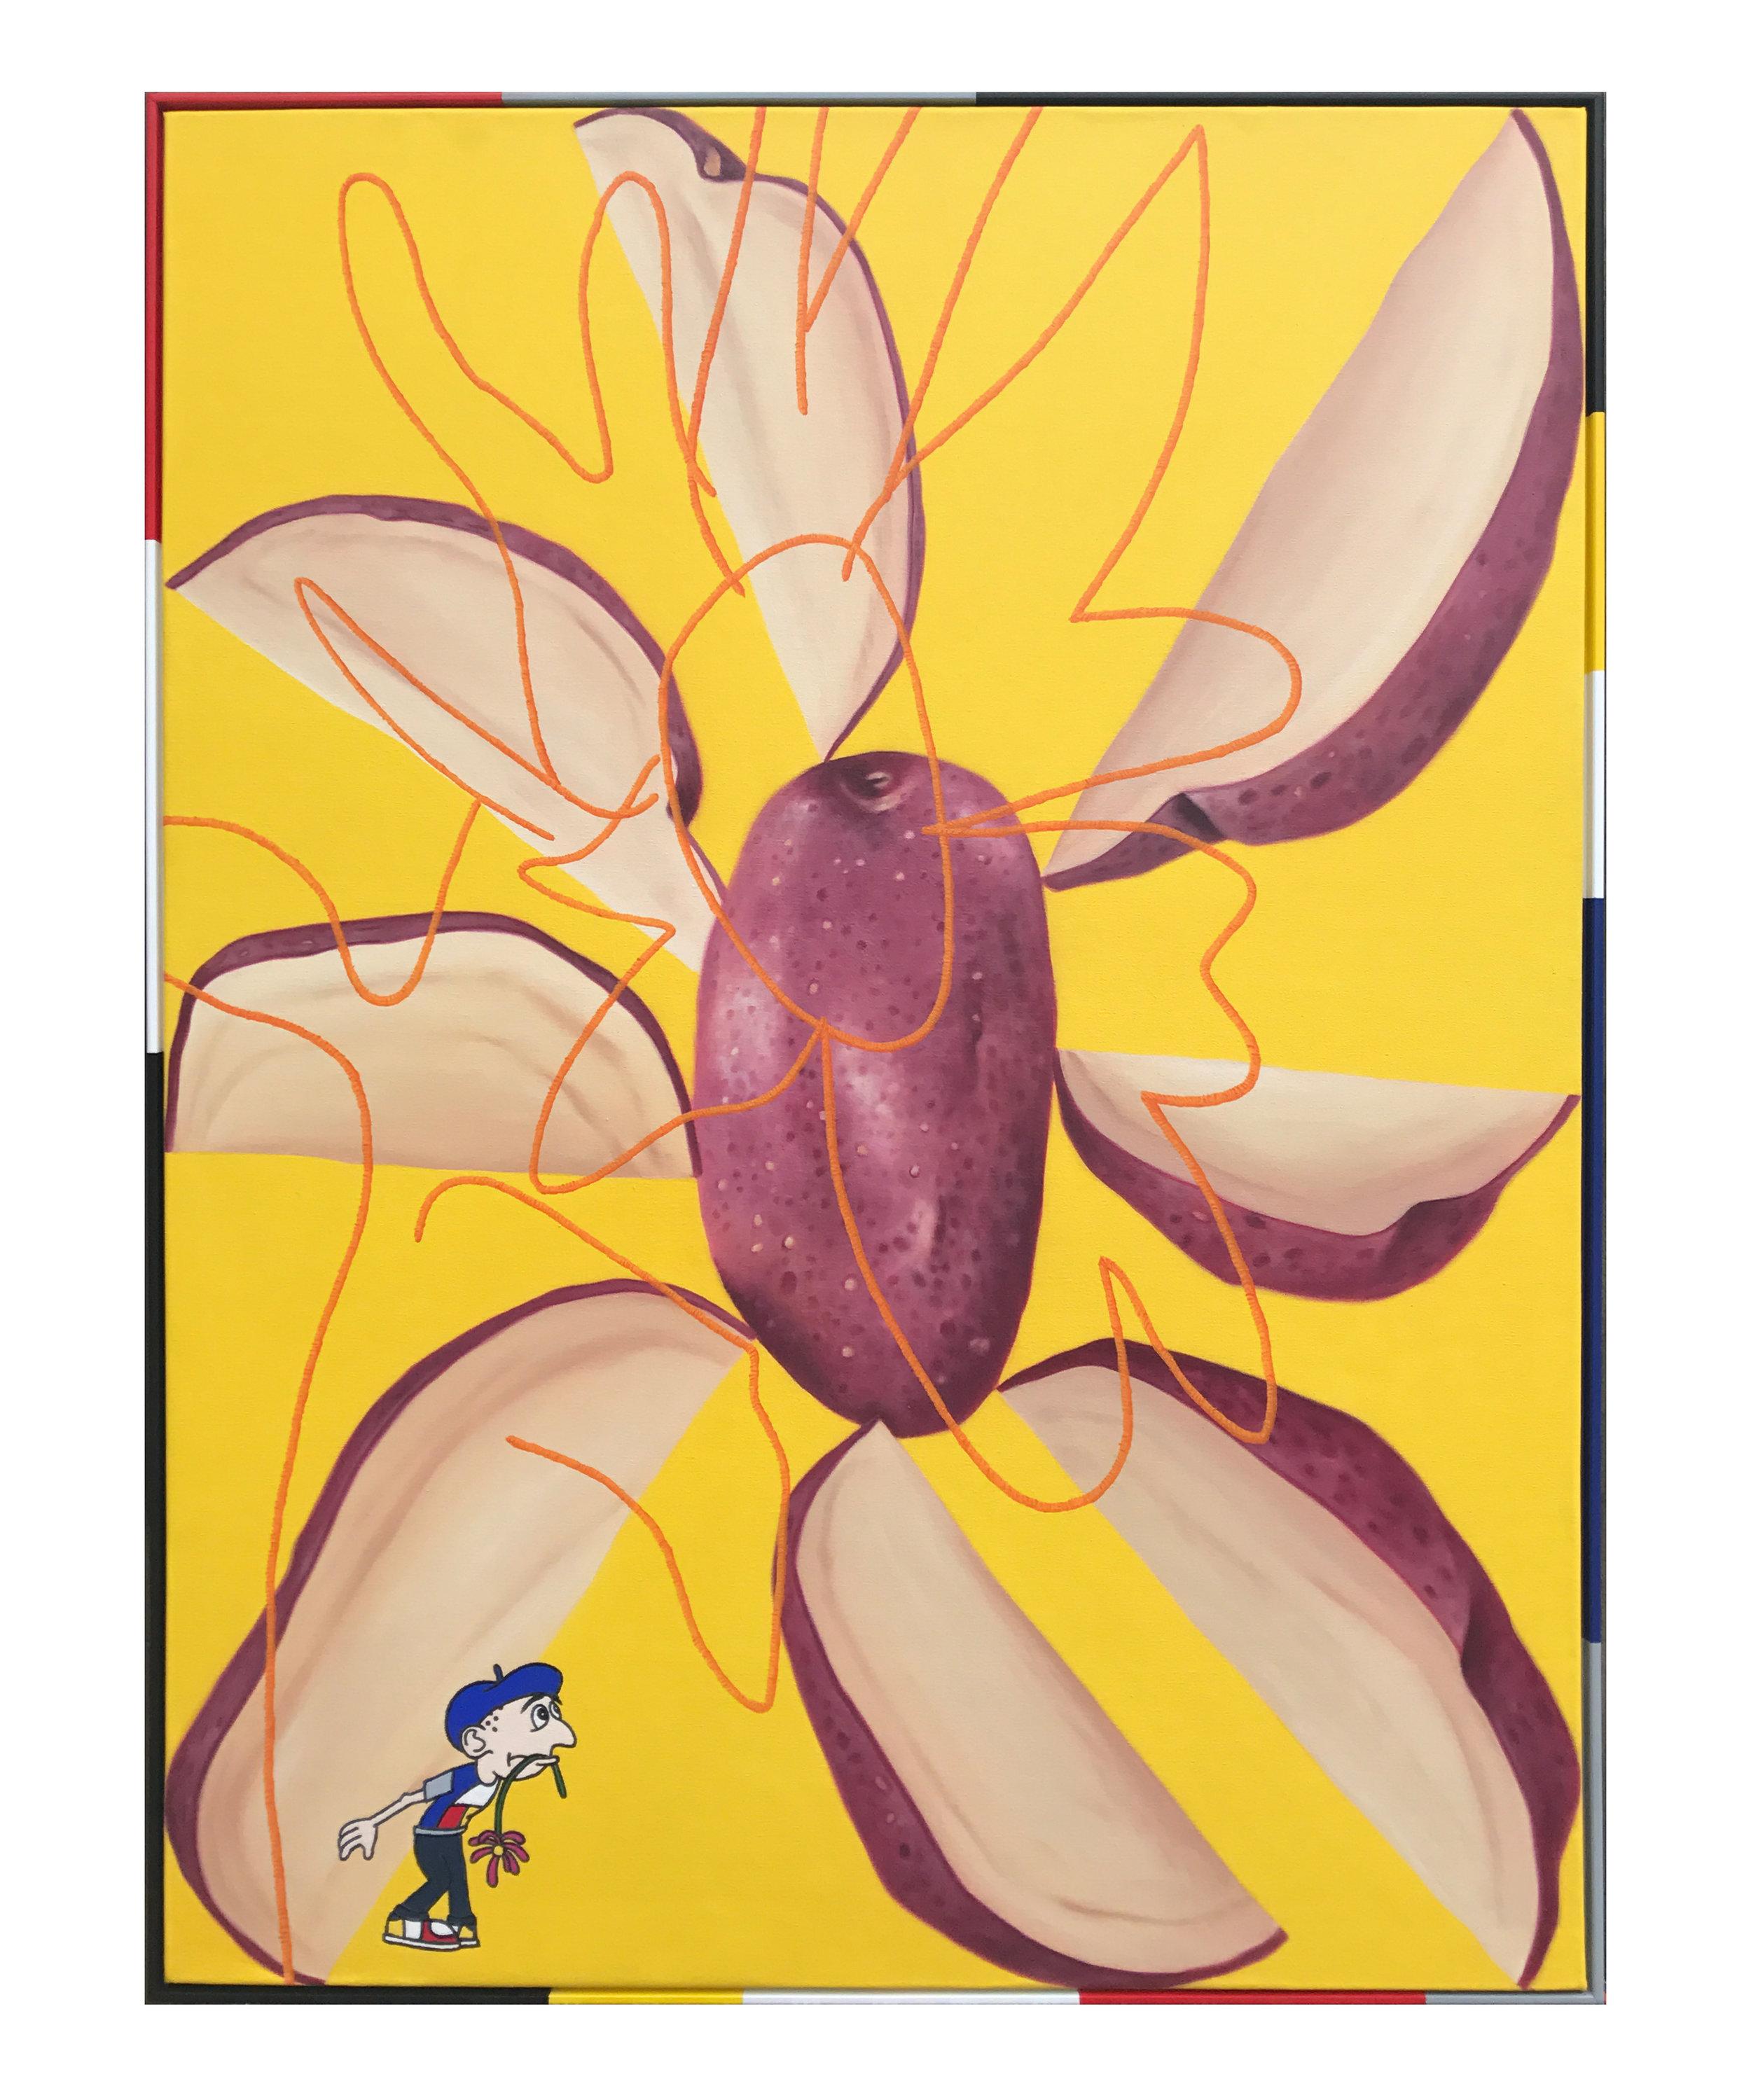 'Sunflower', oil on canvas, artist frame. 123 x 93cm. 2017